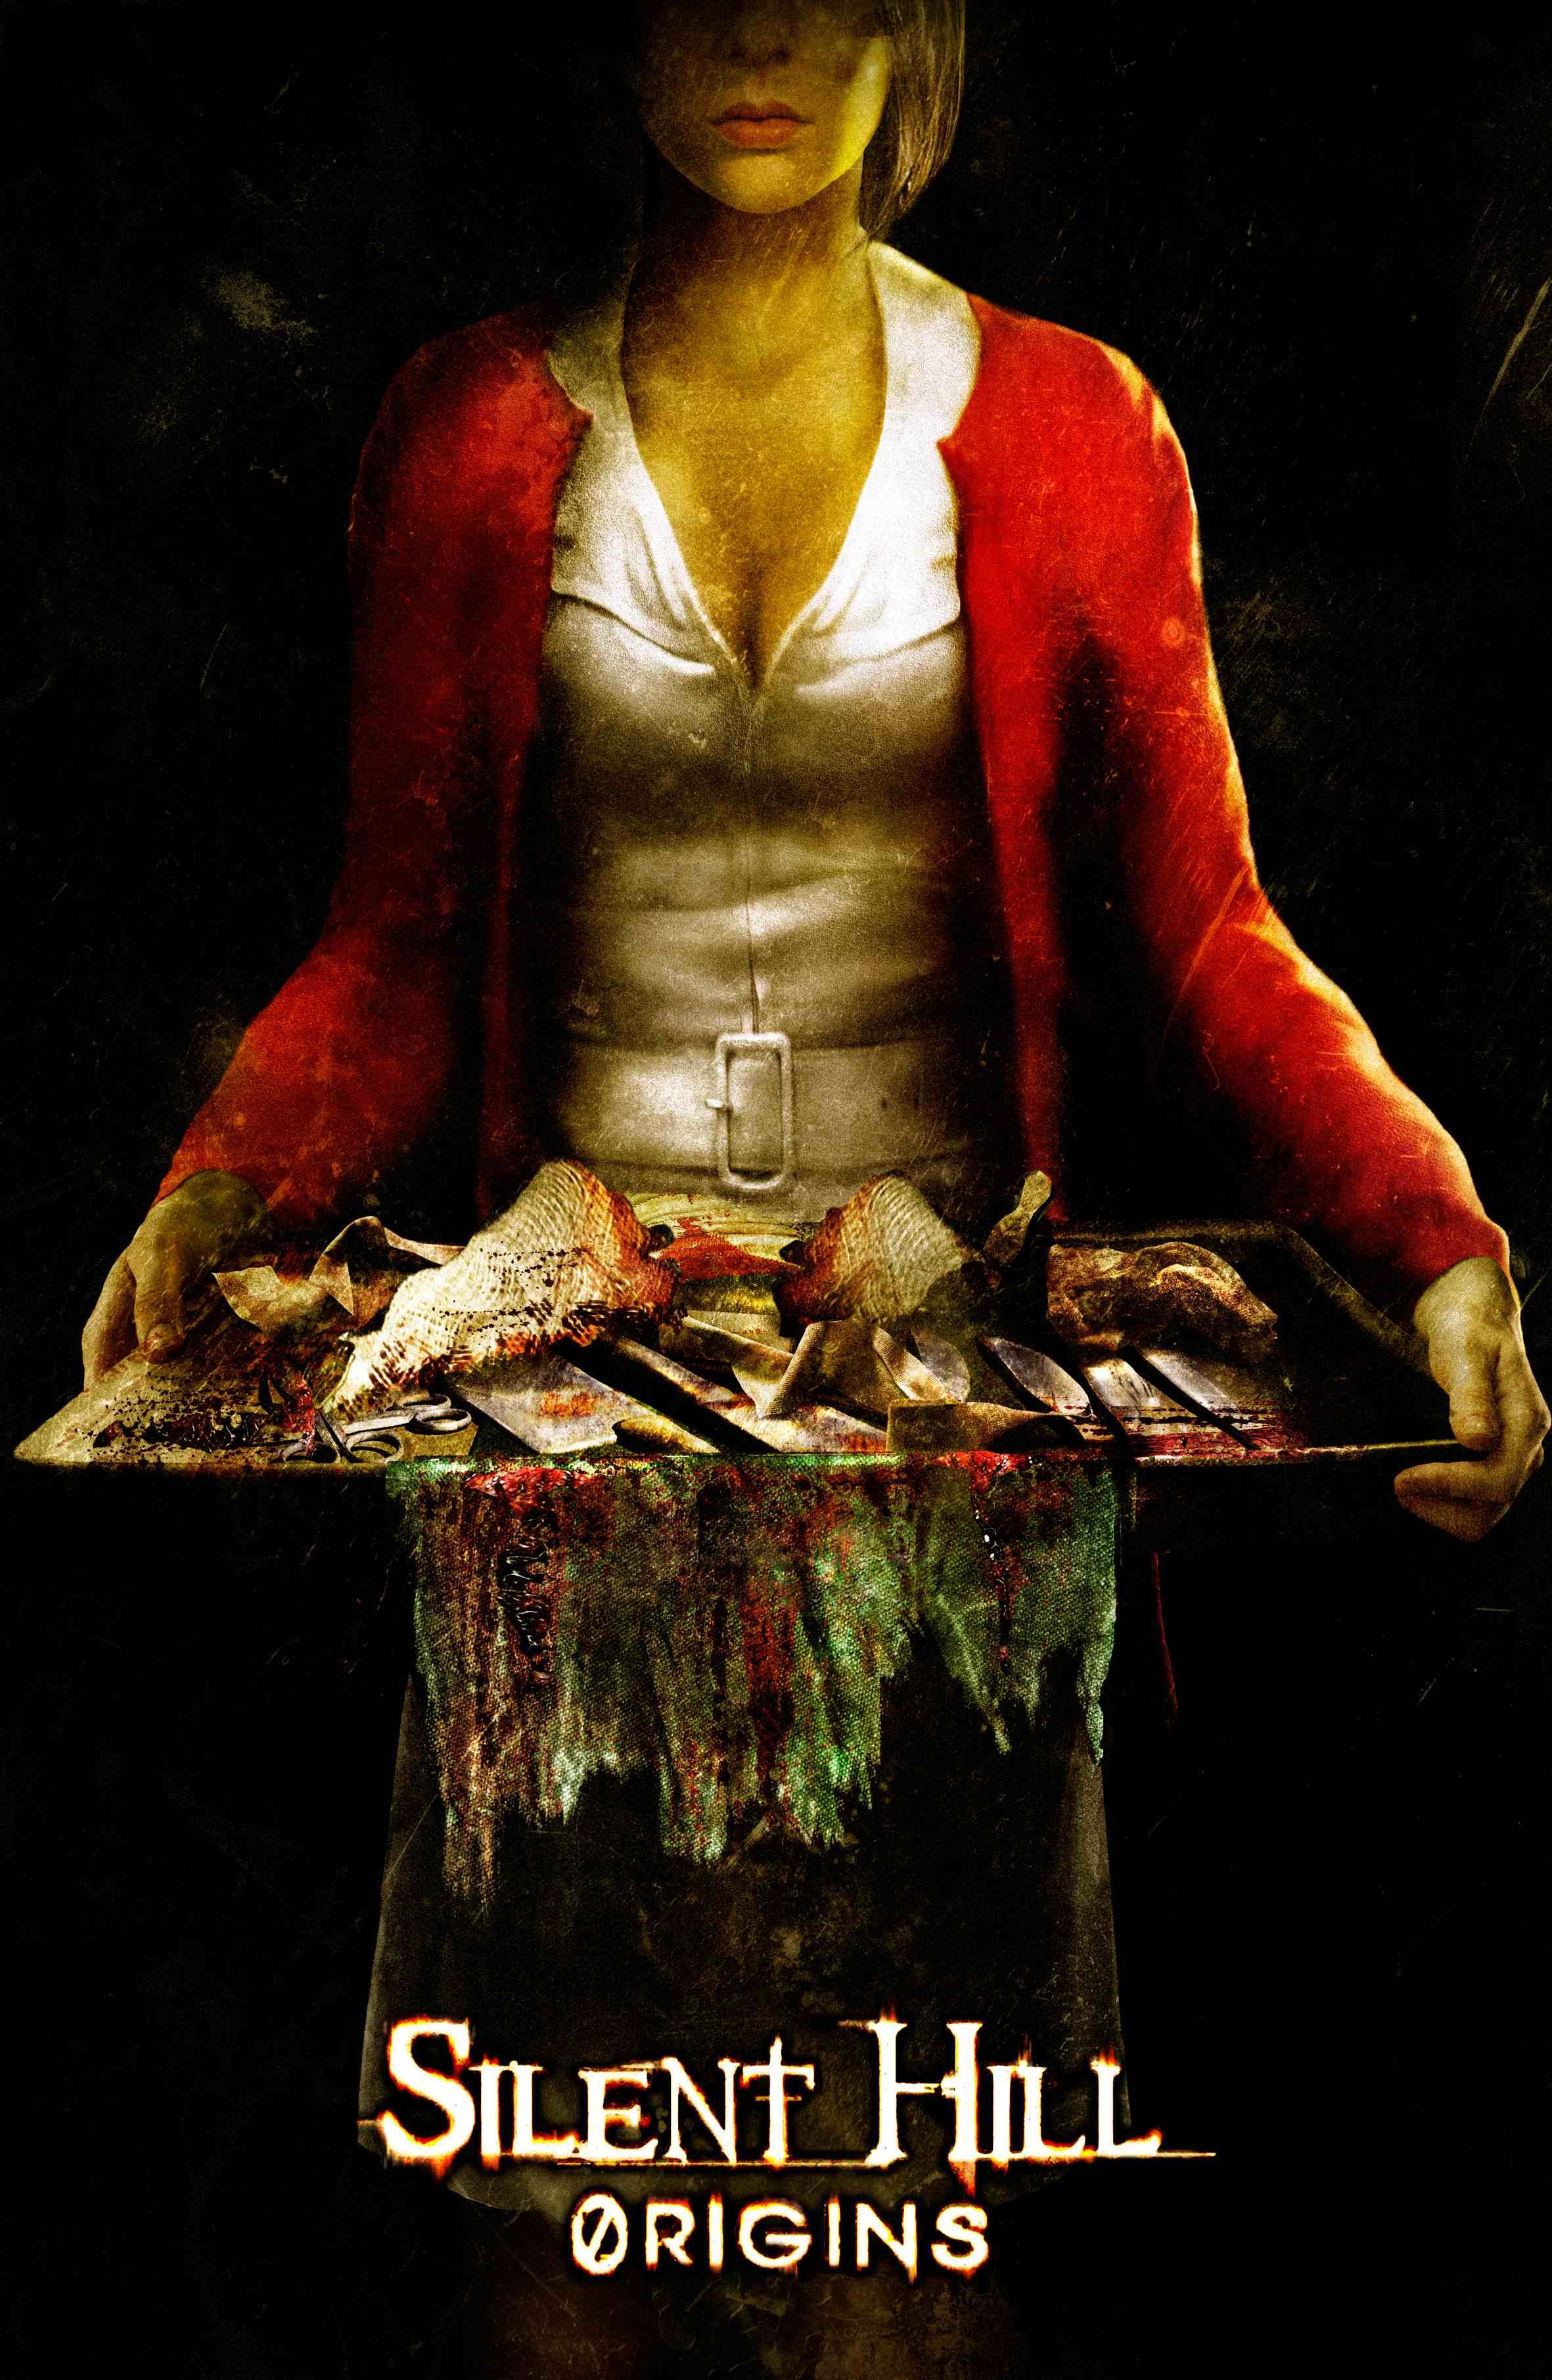 Silent Hill Origins Video Game 2007 Imdb